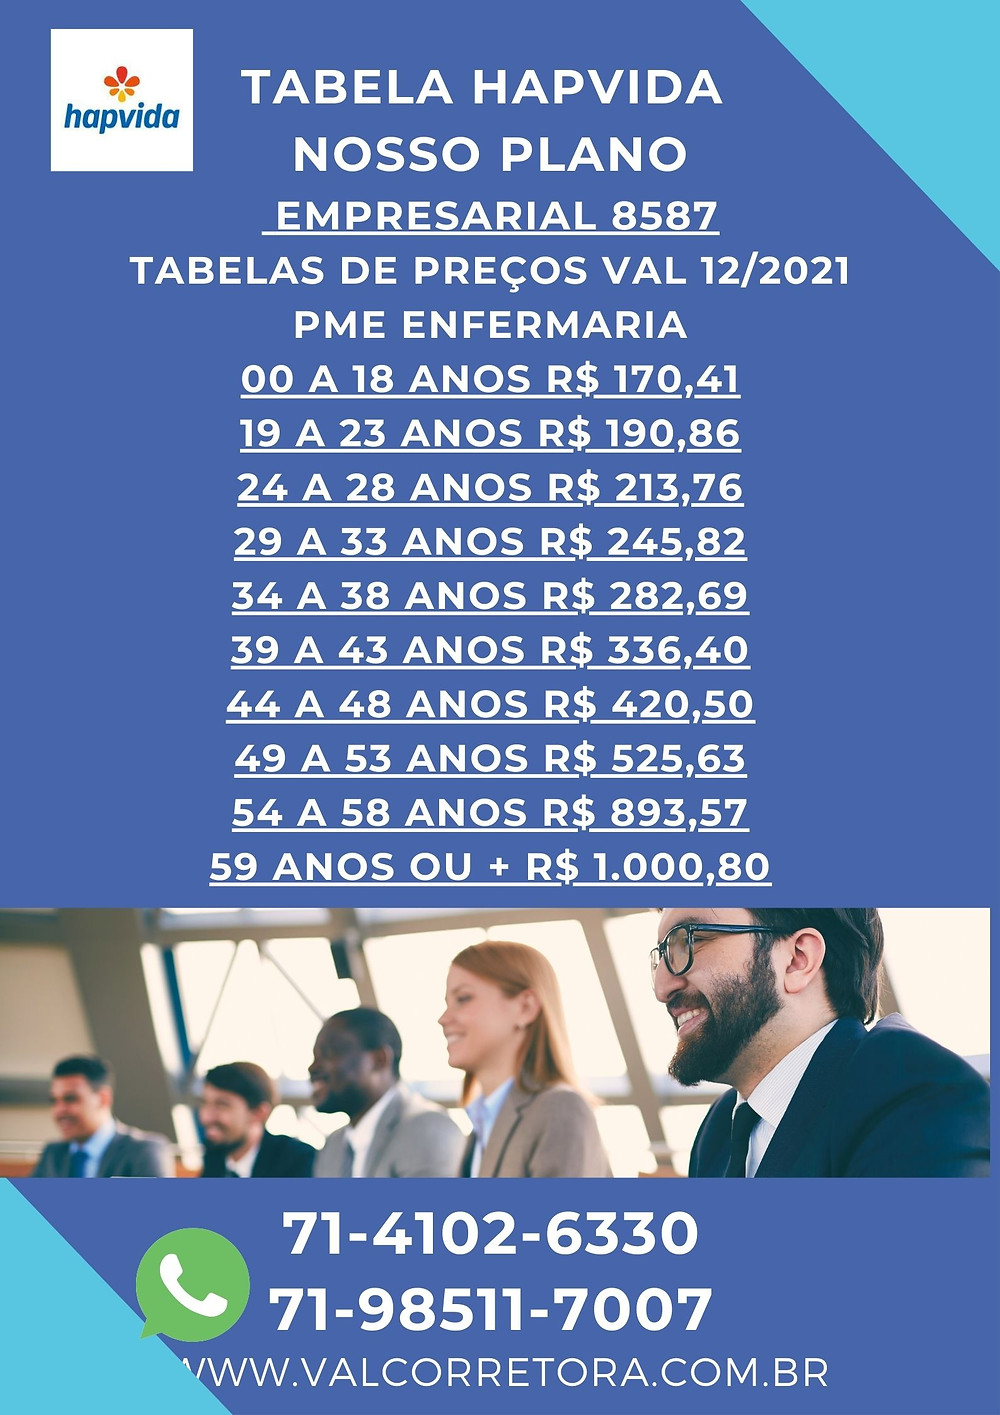 Plano de Saude Empresarial - Preços